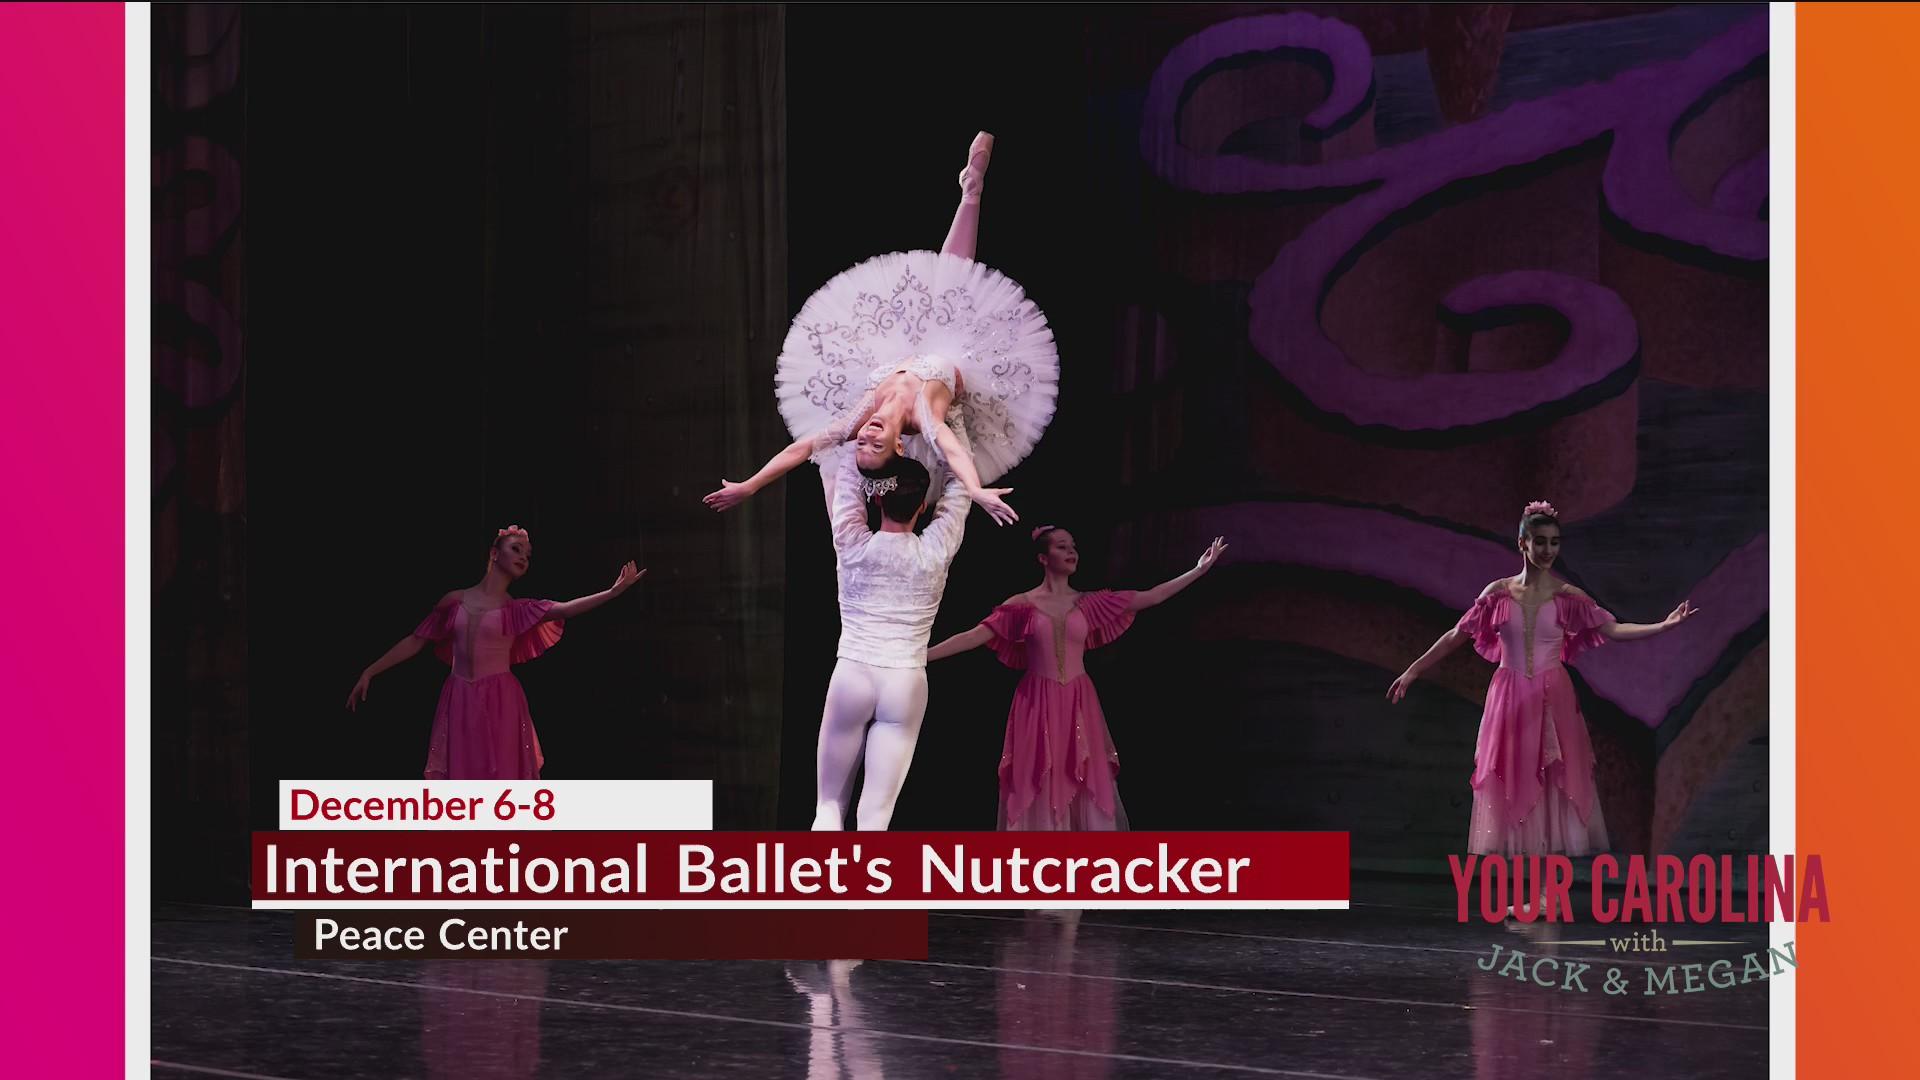 International Ballet's Nutcracker at The Peace Center